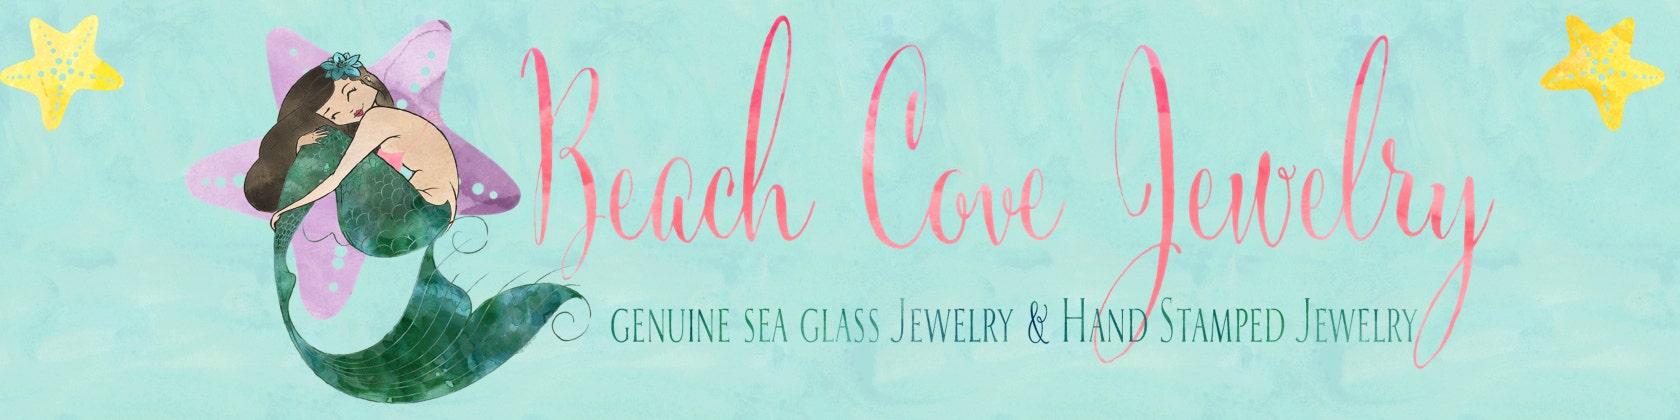 1daf0d8ab09880 Genuine Sea Glass Jewelry & Hand Stamped by BeachCoveJewelry